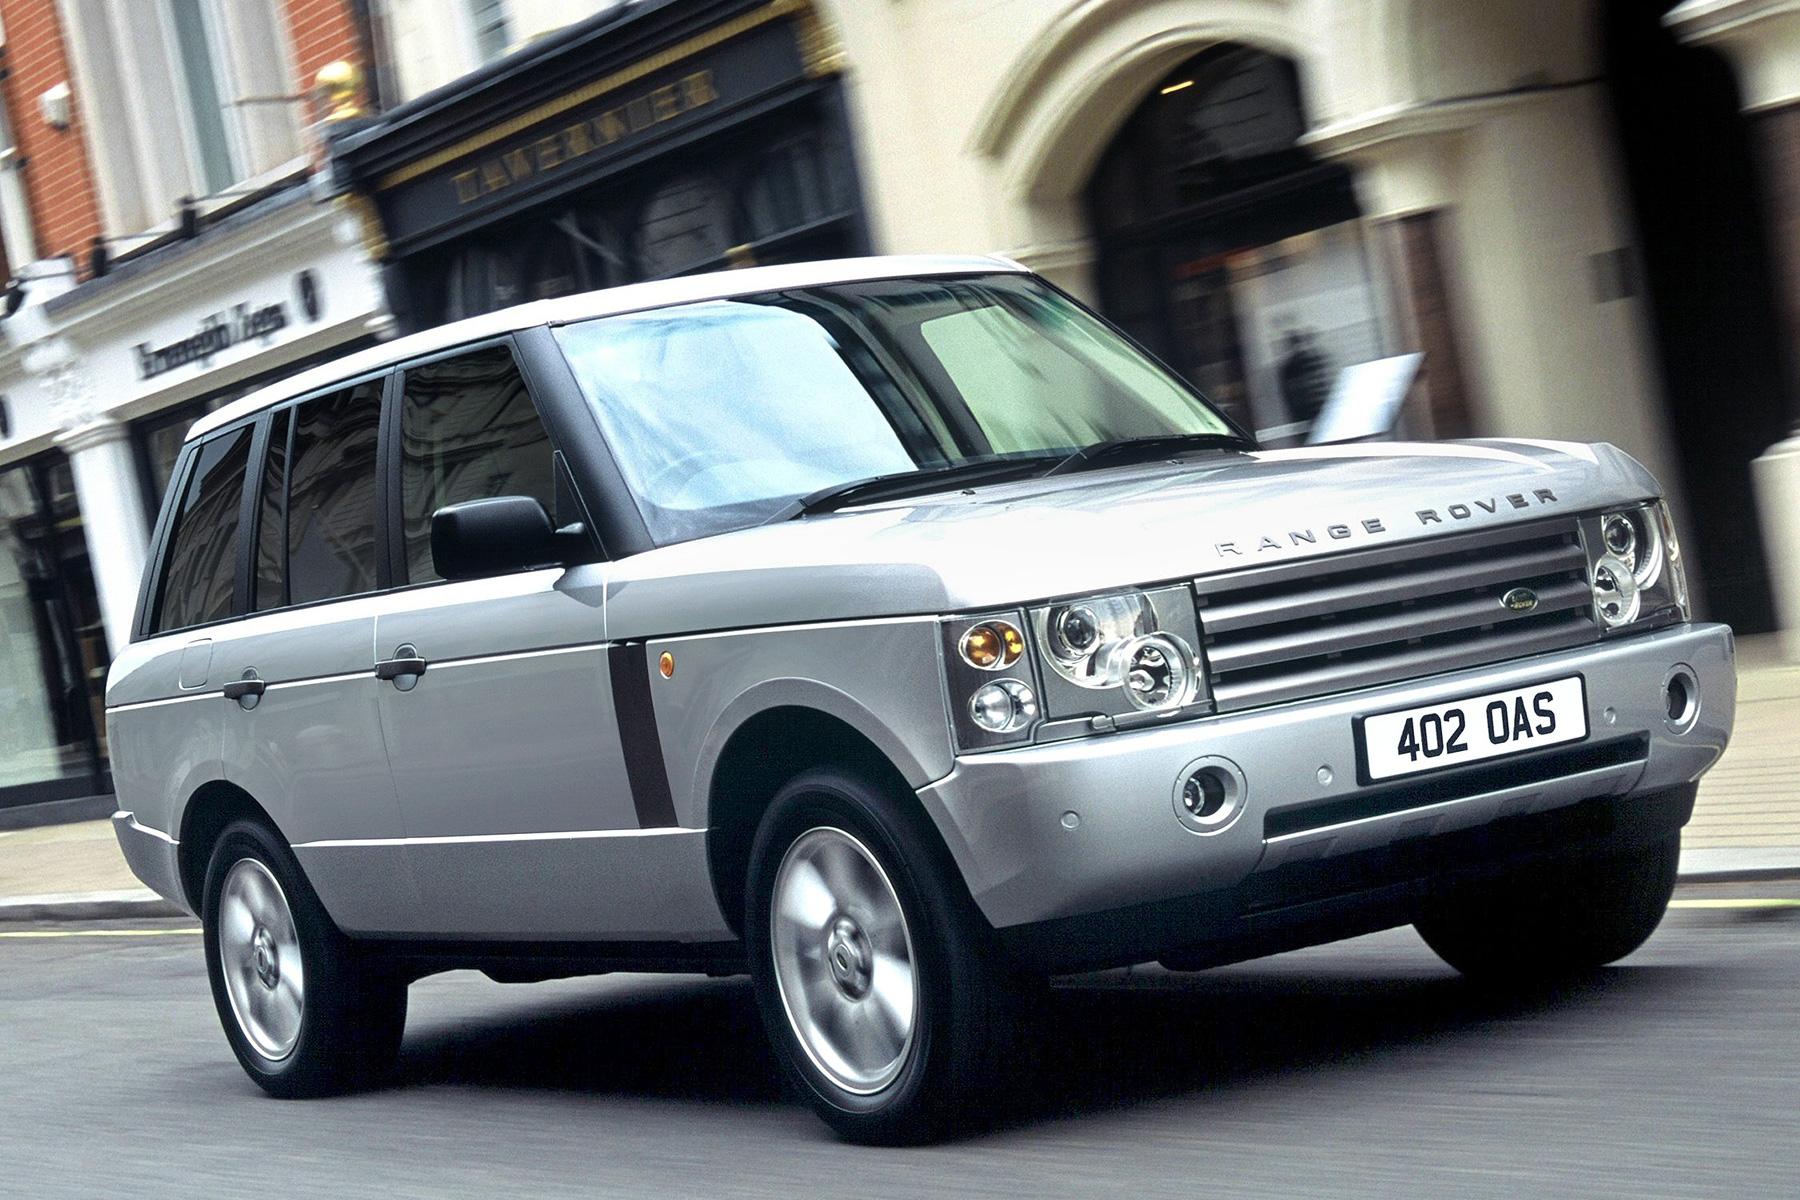 Third-generation Range Rover